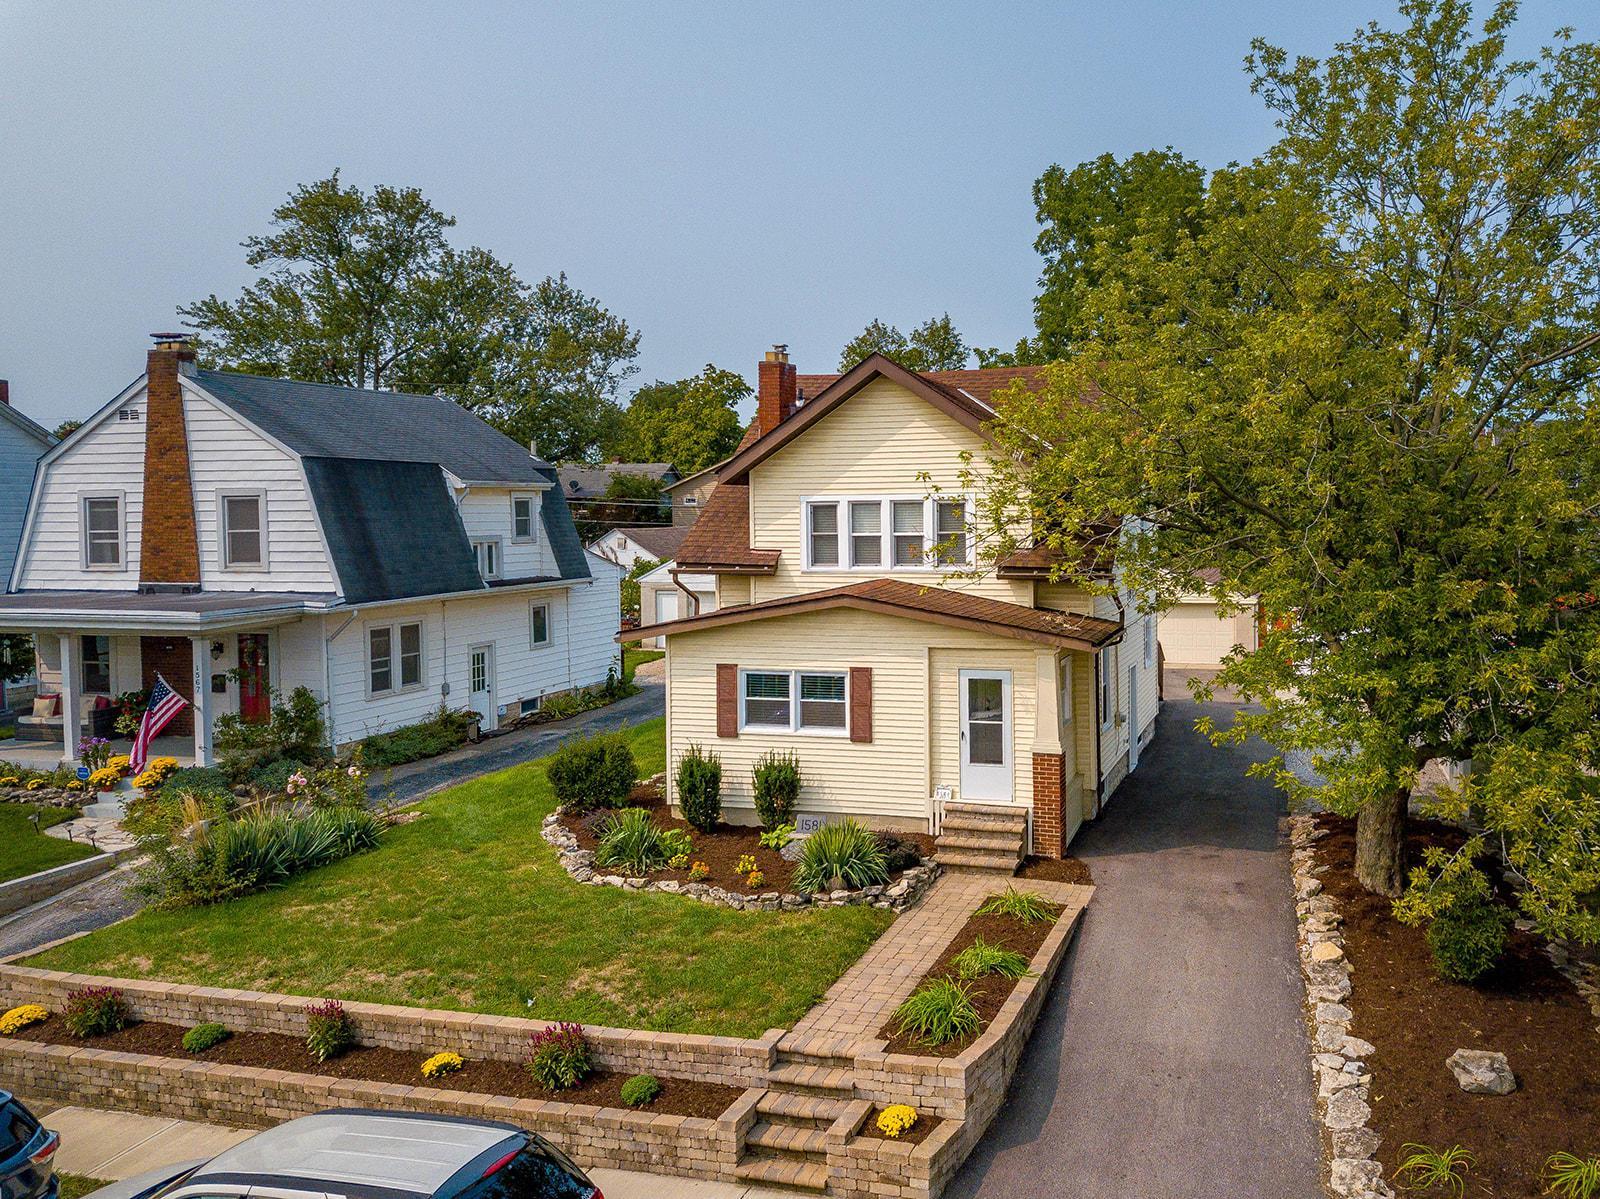 1581 Wyandotte Road, Grandview Heights, Ohio 43212, 3 Bedrooms Bedrooms, ,2 BathroomsBathrooms,Residential,For Sale,Wyandotte,220032223